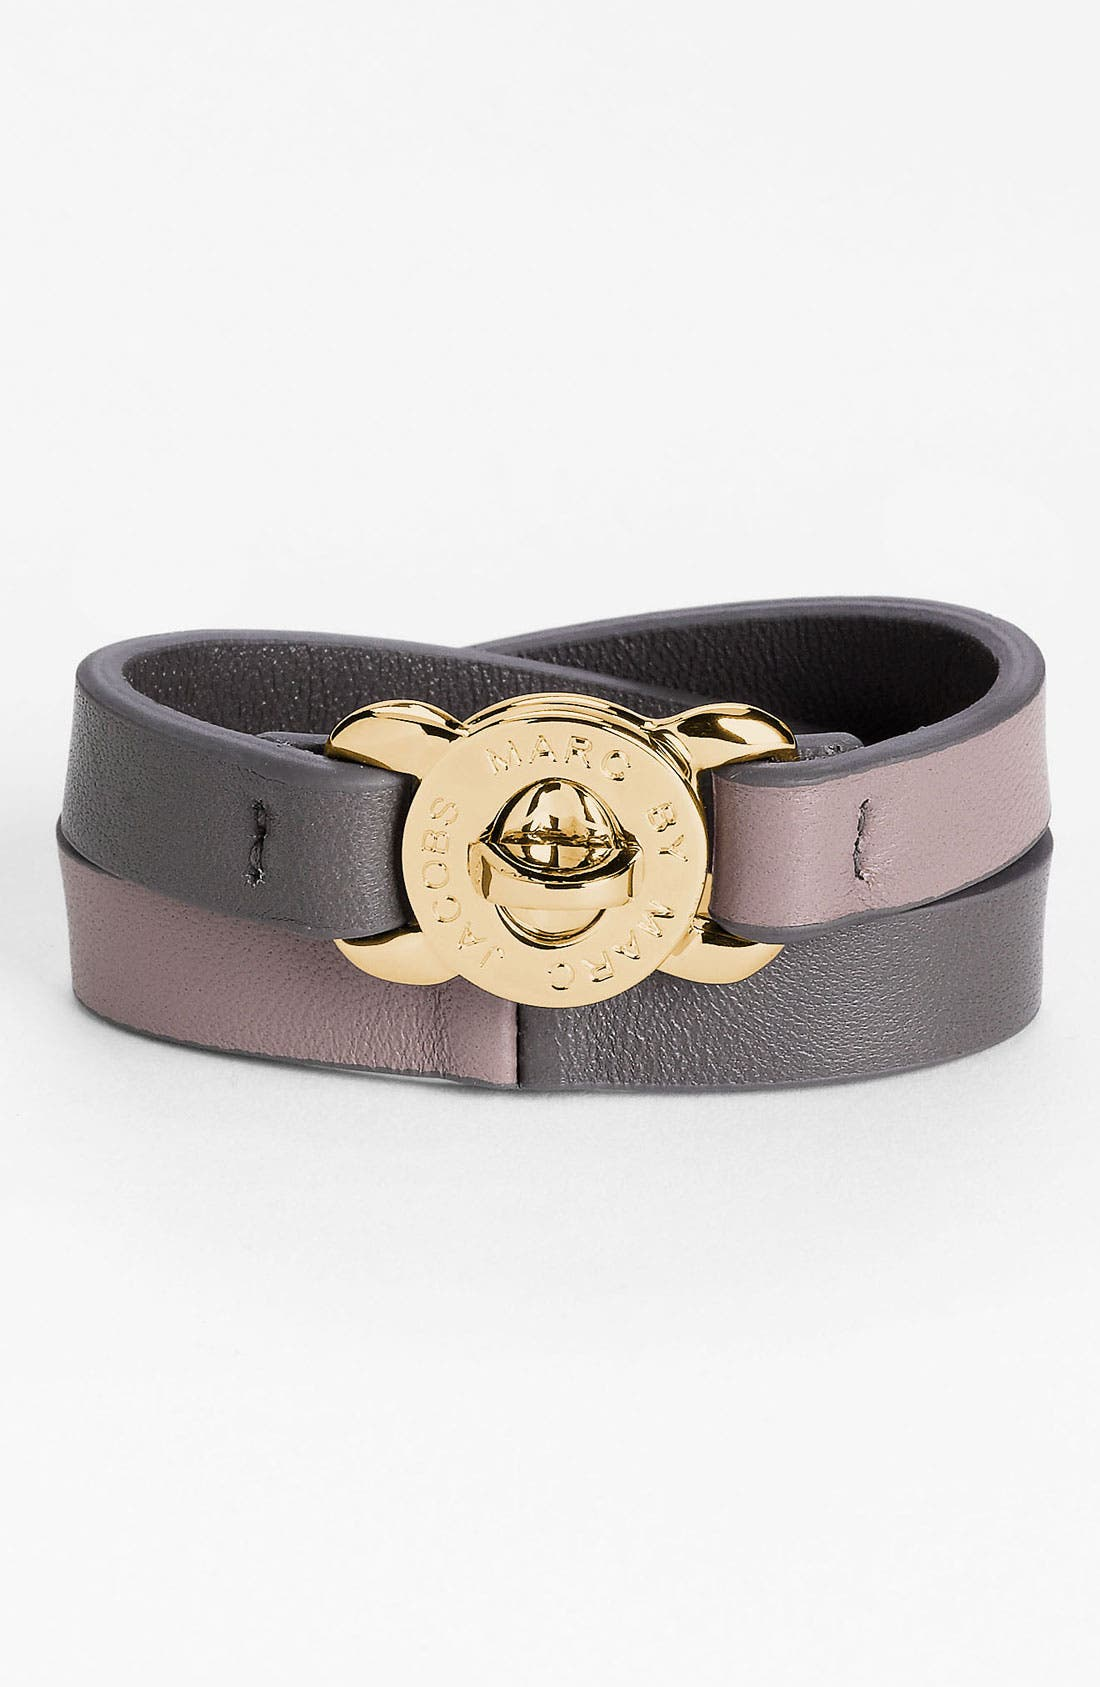 Main Image - MARC BY MARC JACOBS 'Katie' Double Wrap Leather Bracelet